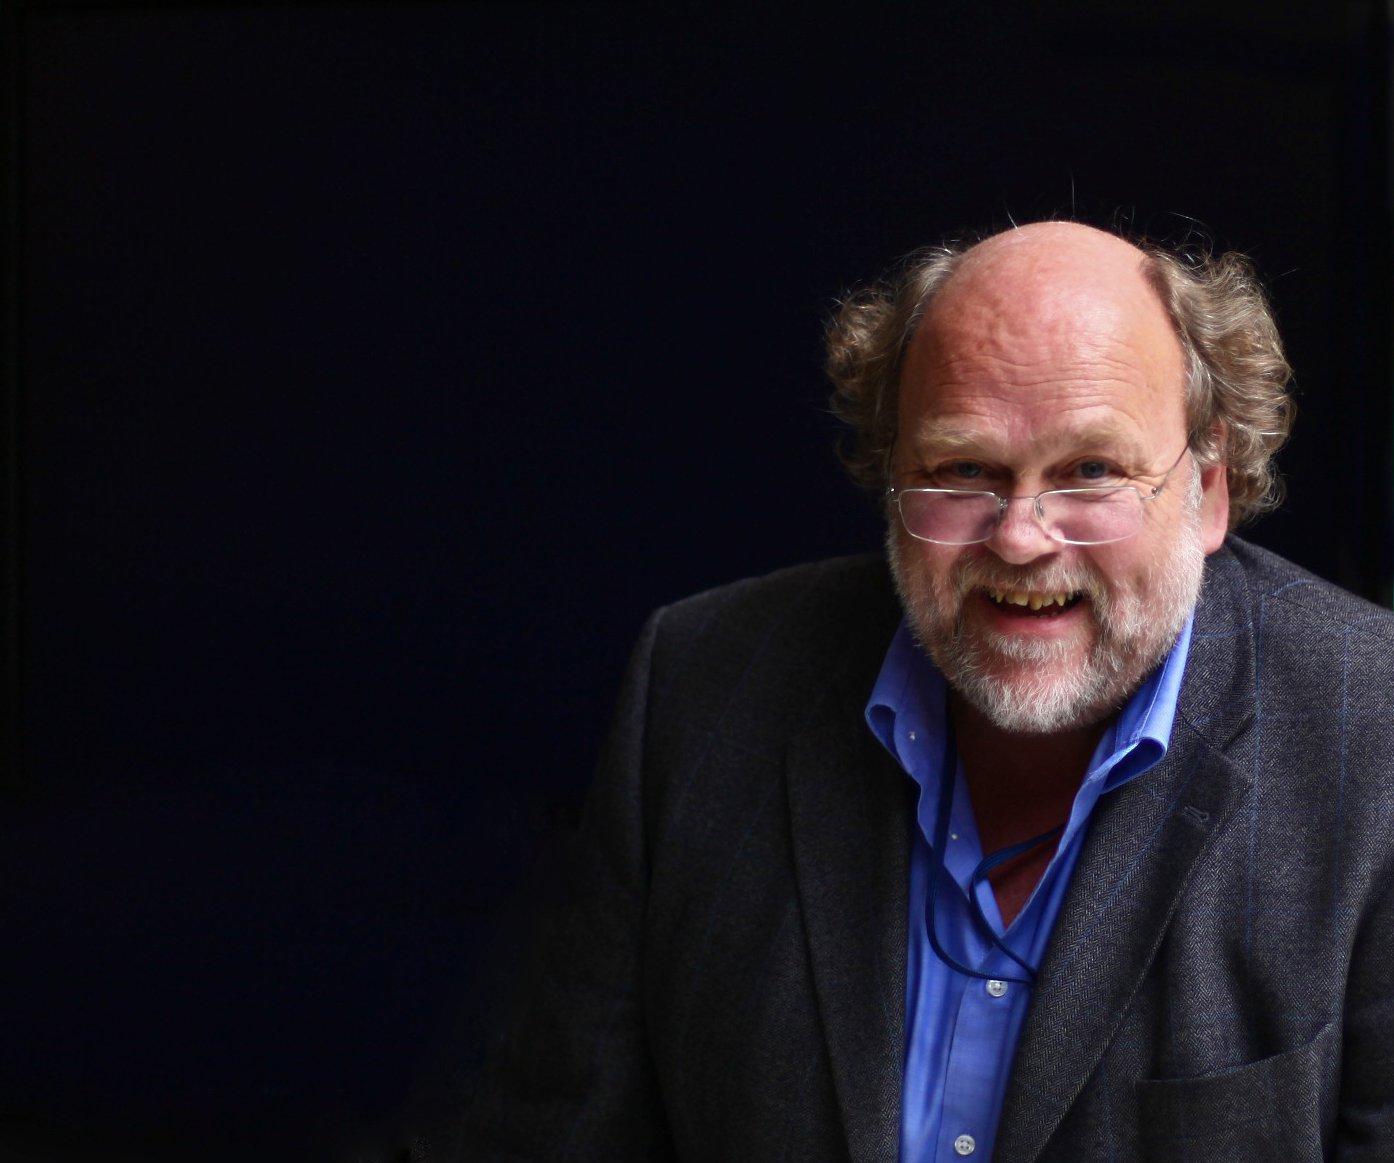 Picture of Philipp Davies